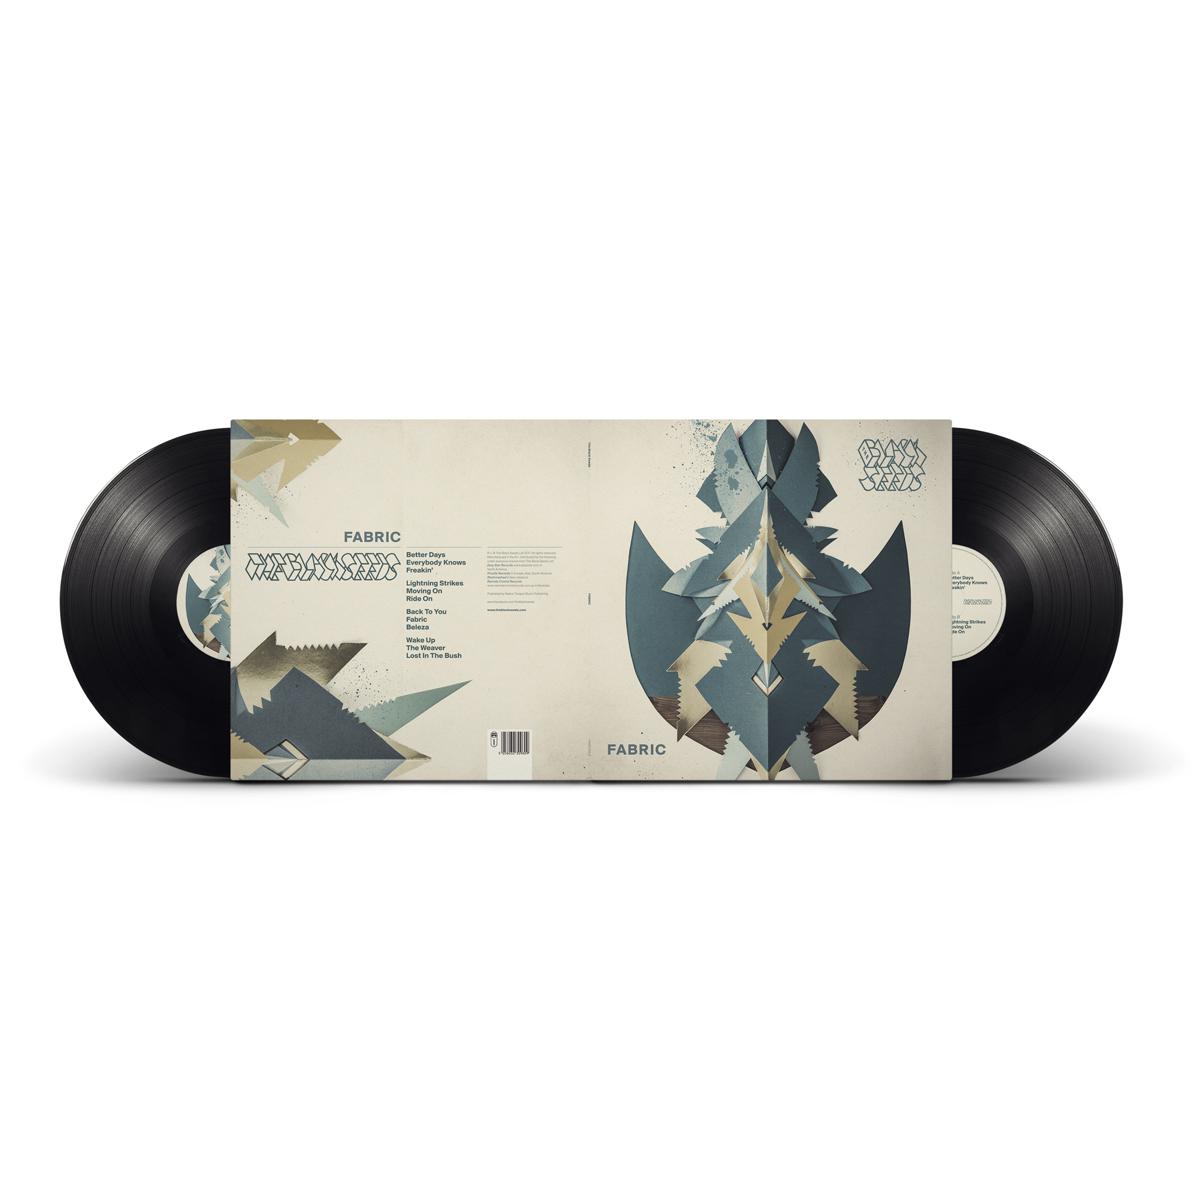 The Black Seeds – Fabric CD + LP Bundle